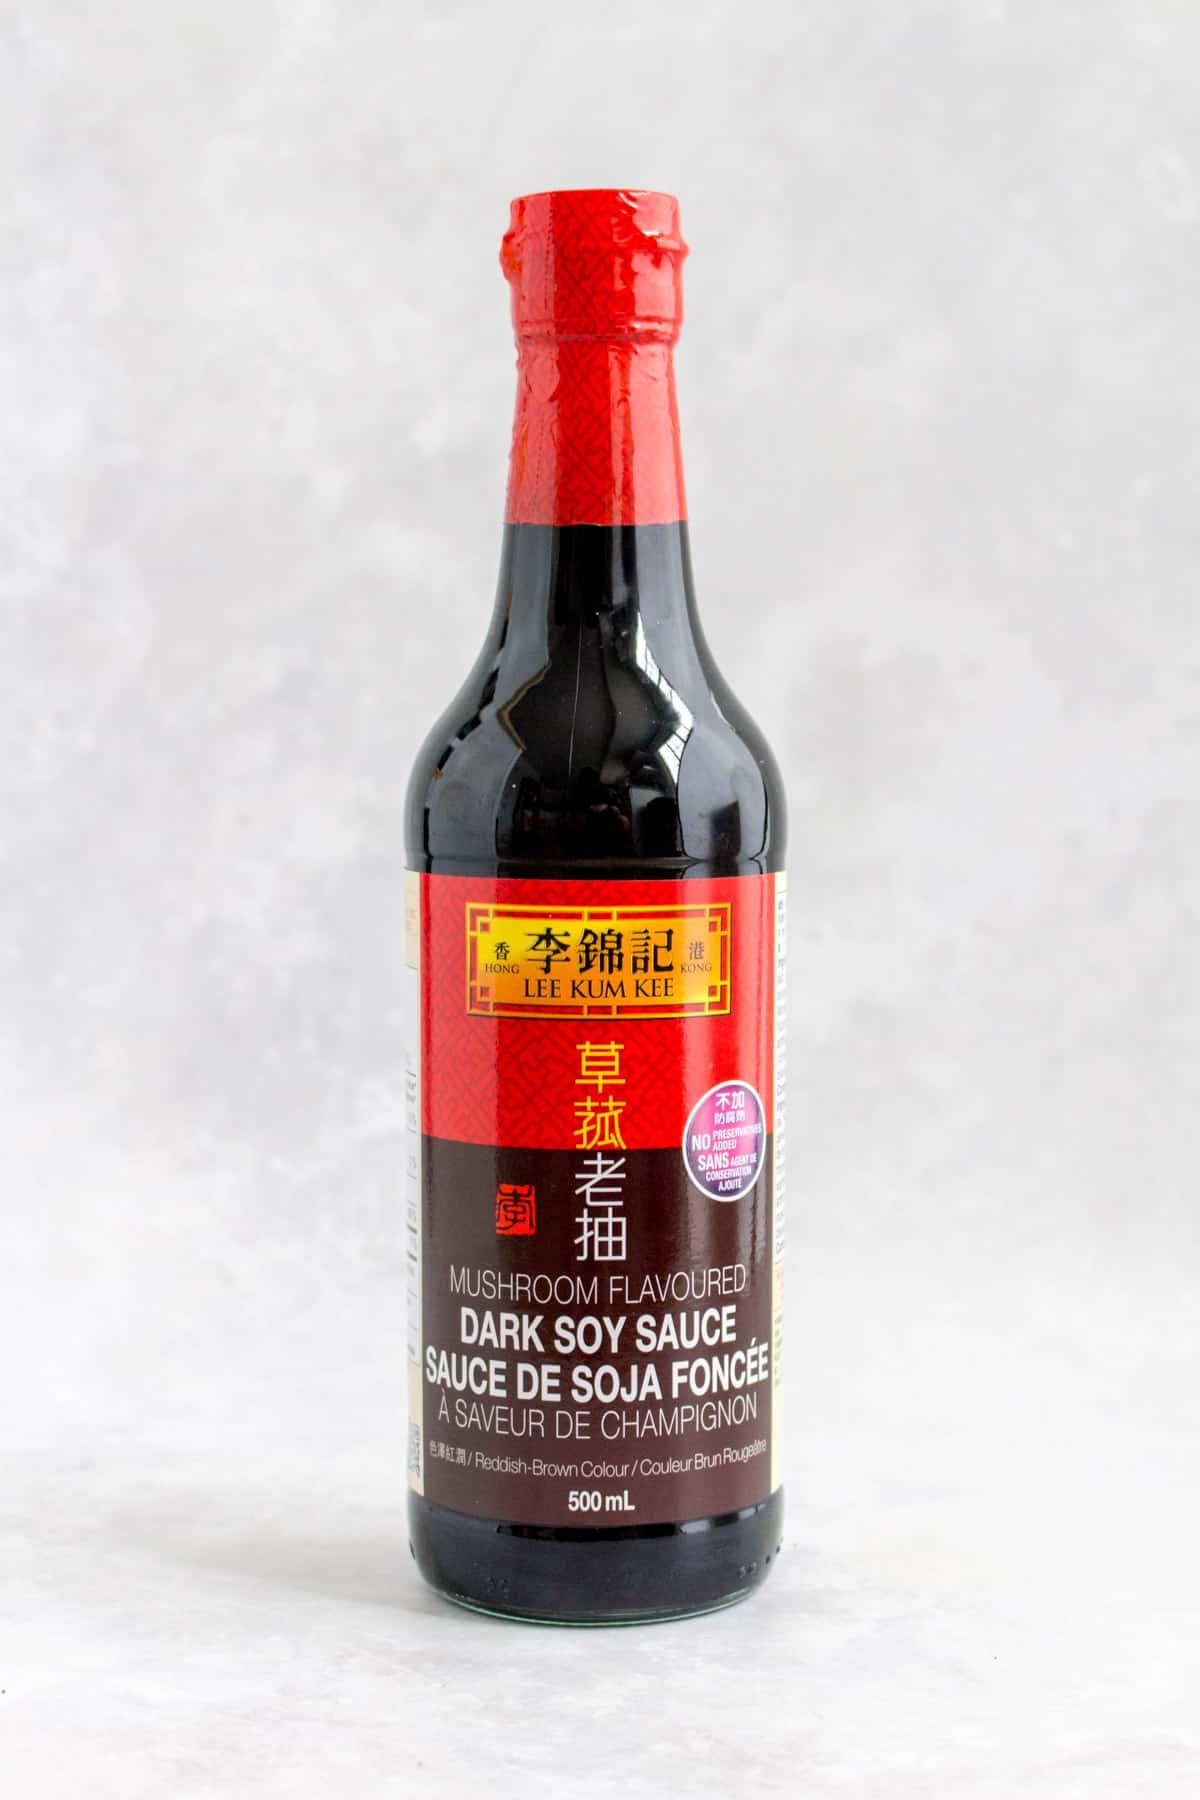 Mushroom Flavoured Dark Soy Sauce.